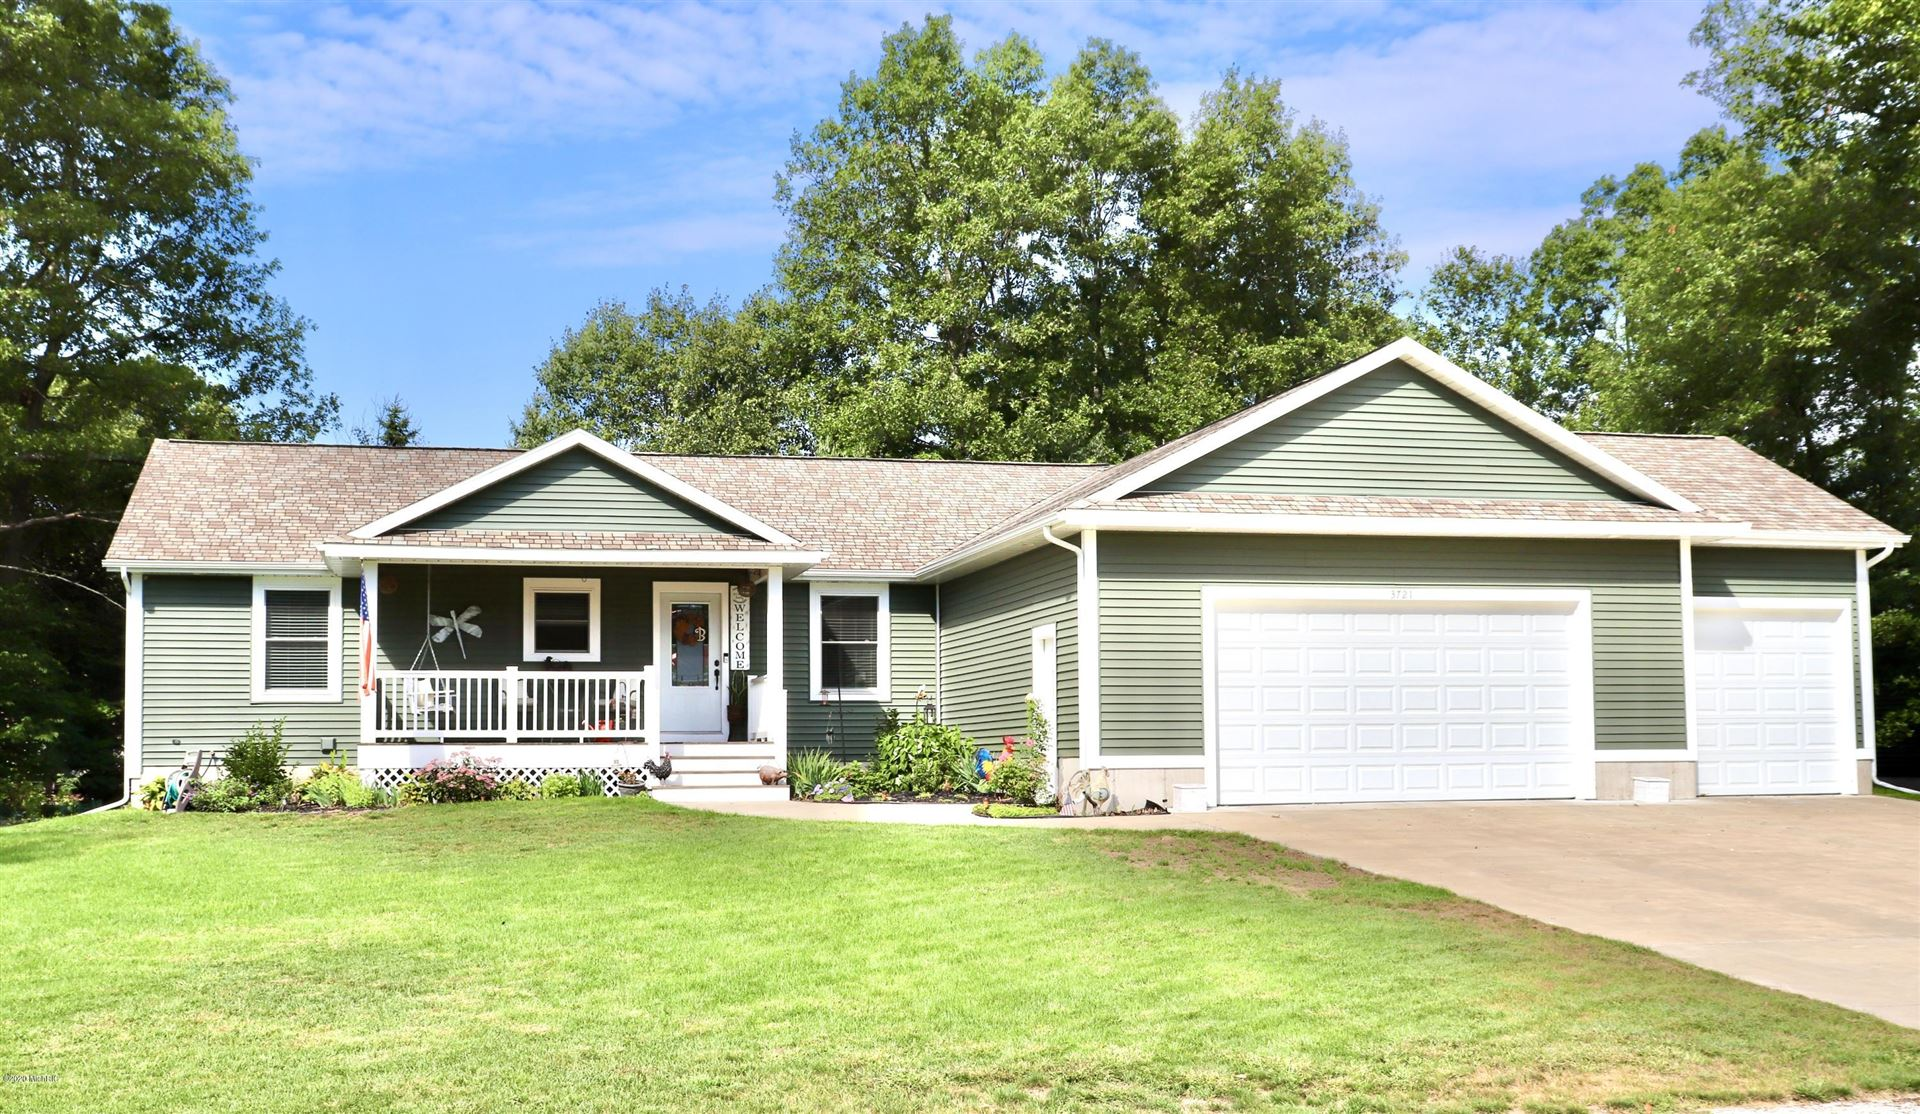 3721 Black Creek Road, Muskegon, MI 49444 - MLS#: 20036913